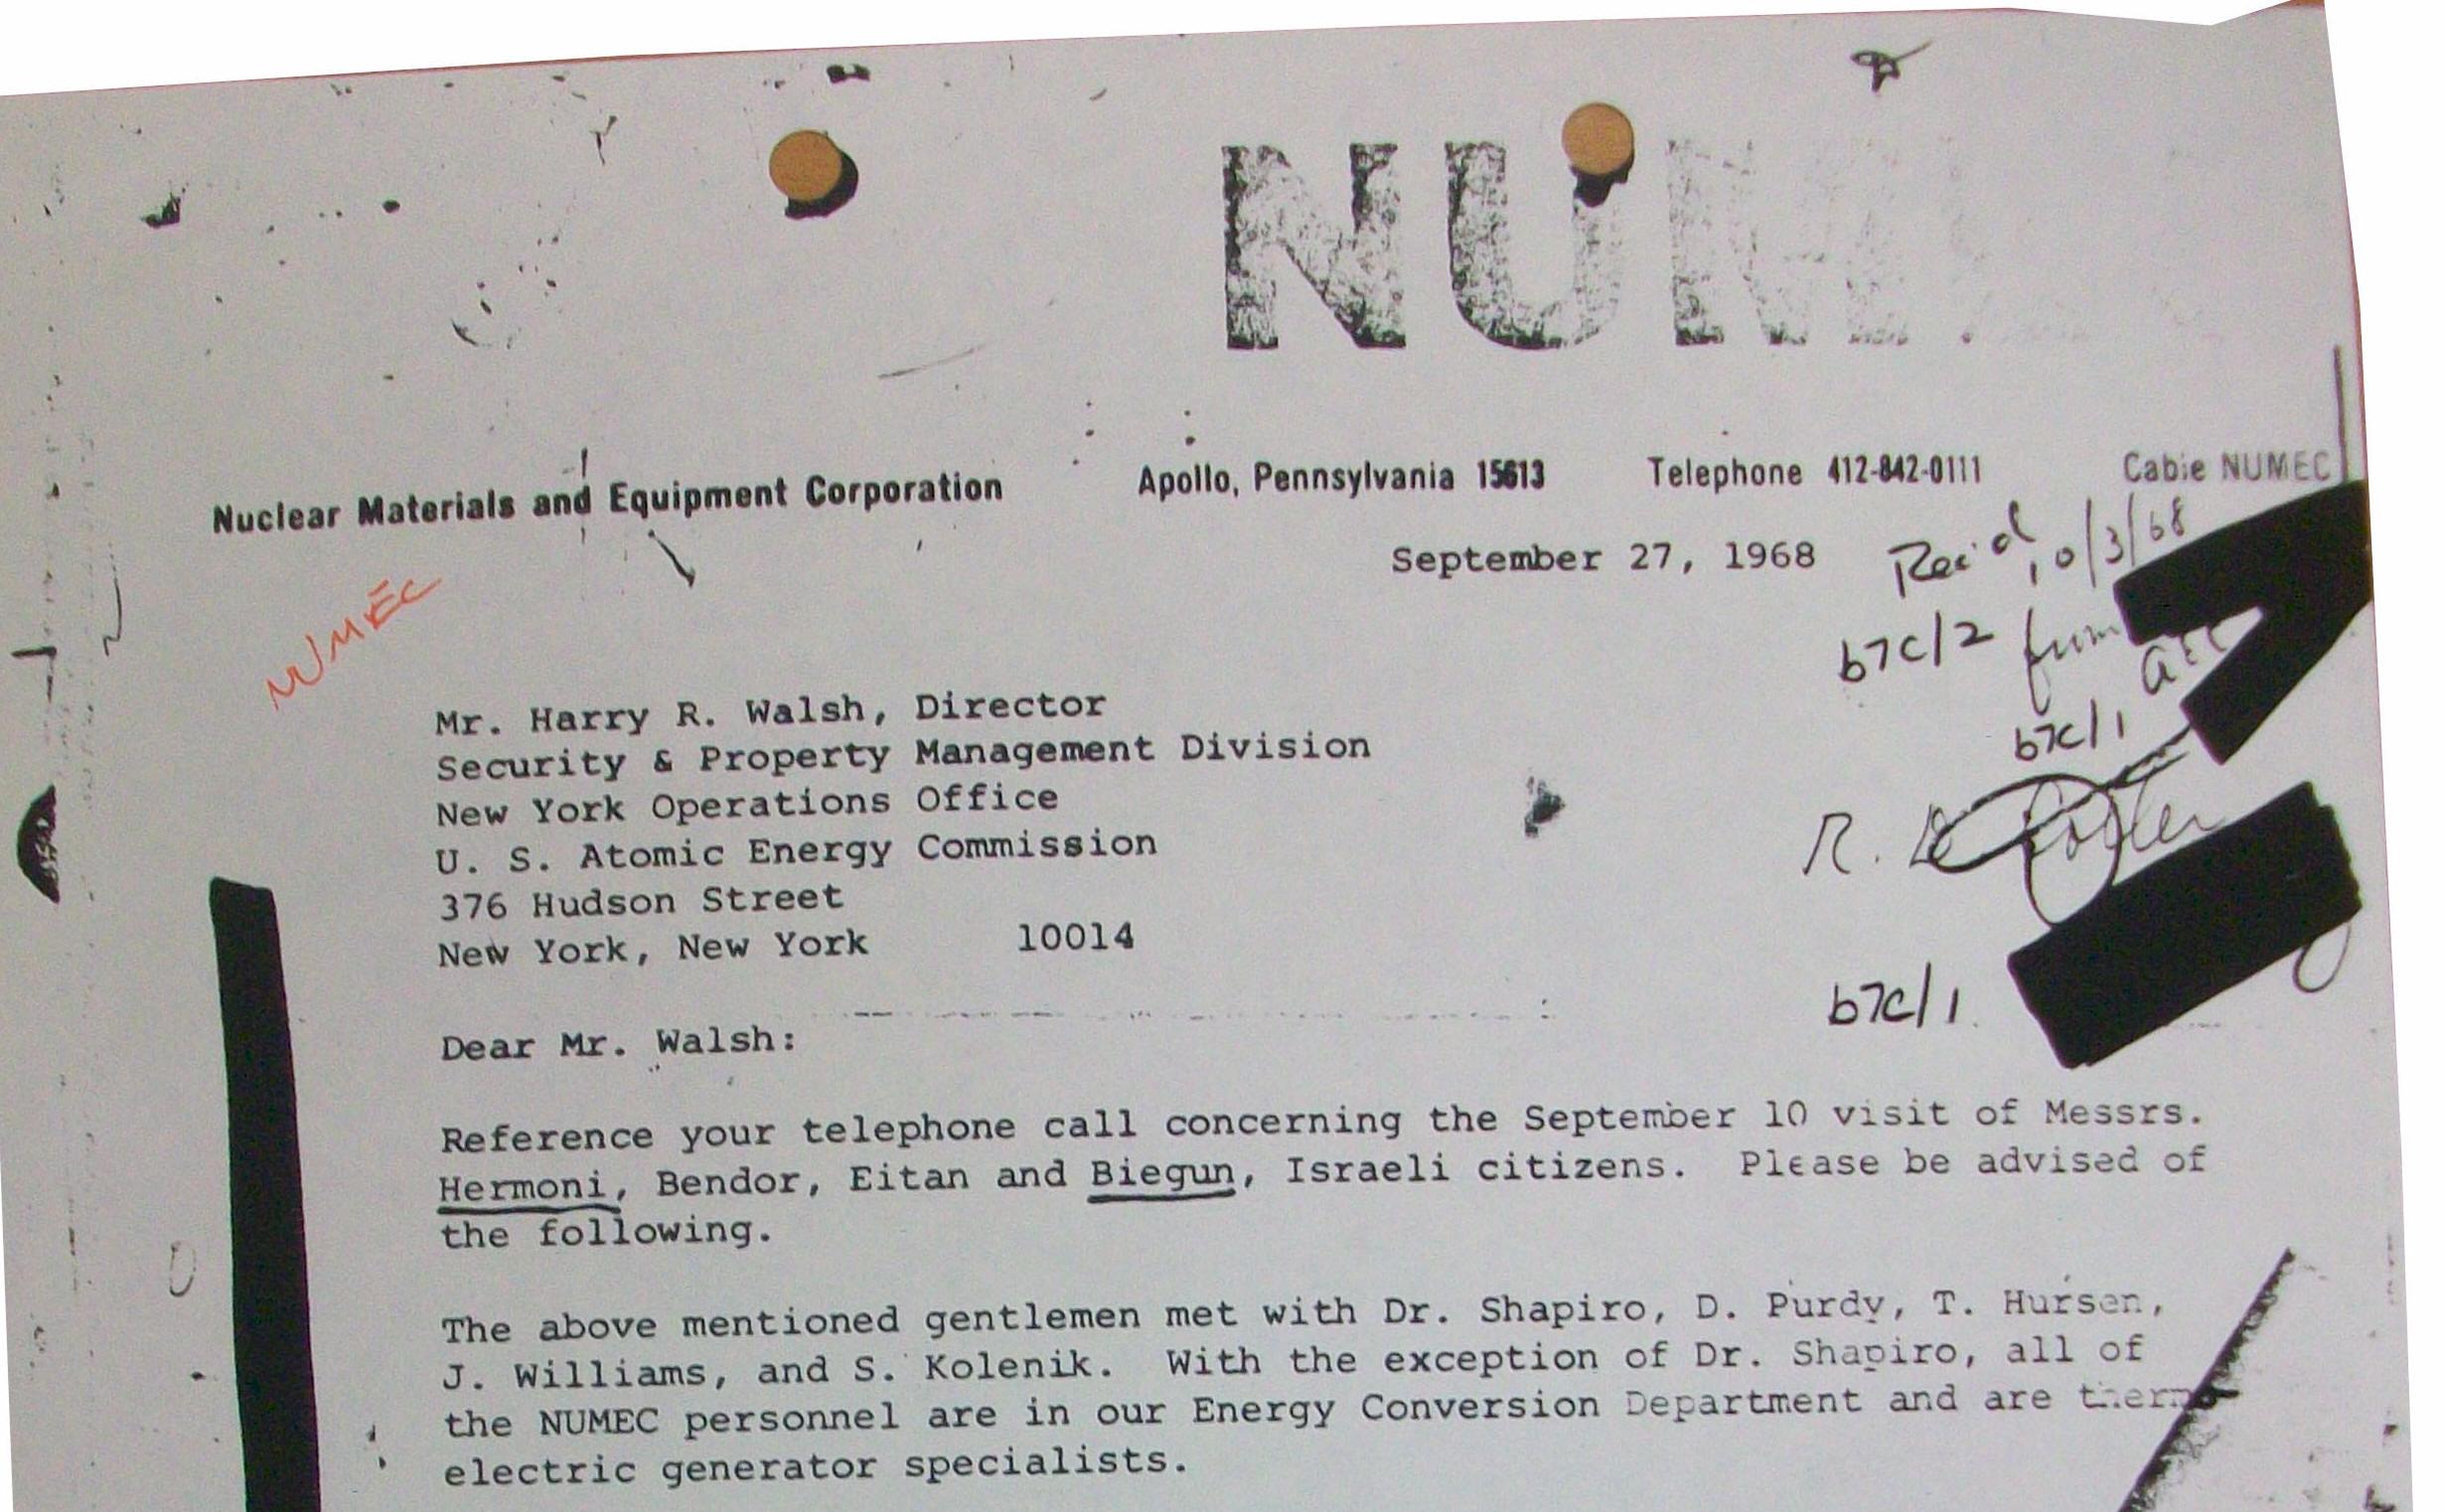 NUMEC- Zalman Shapiro - Uranium diversion to Israel, FBI, CIA files